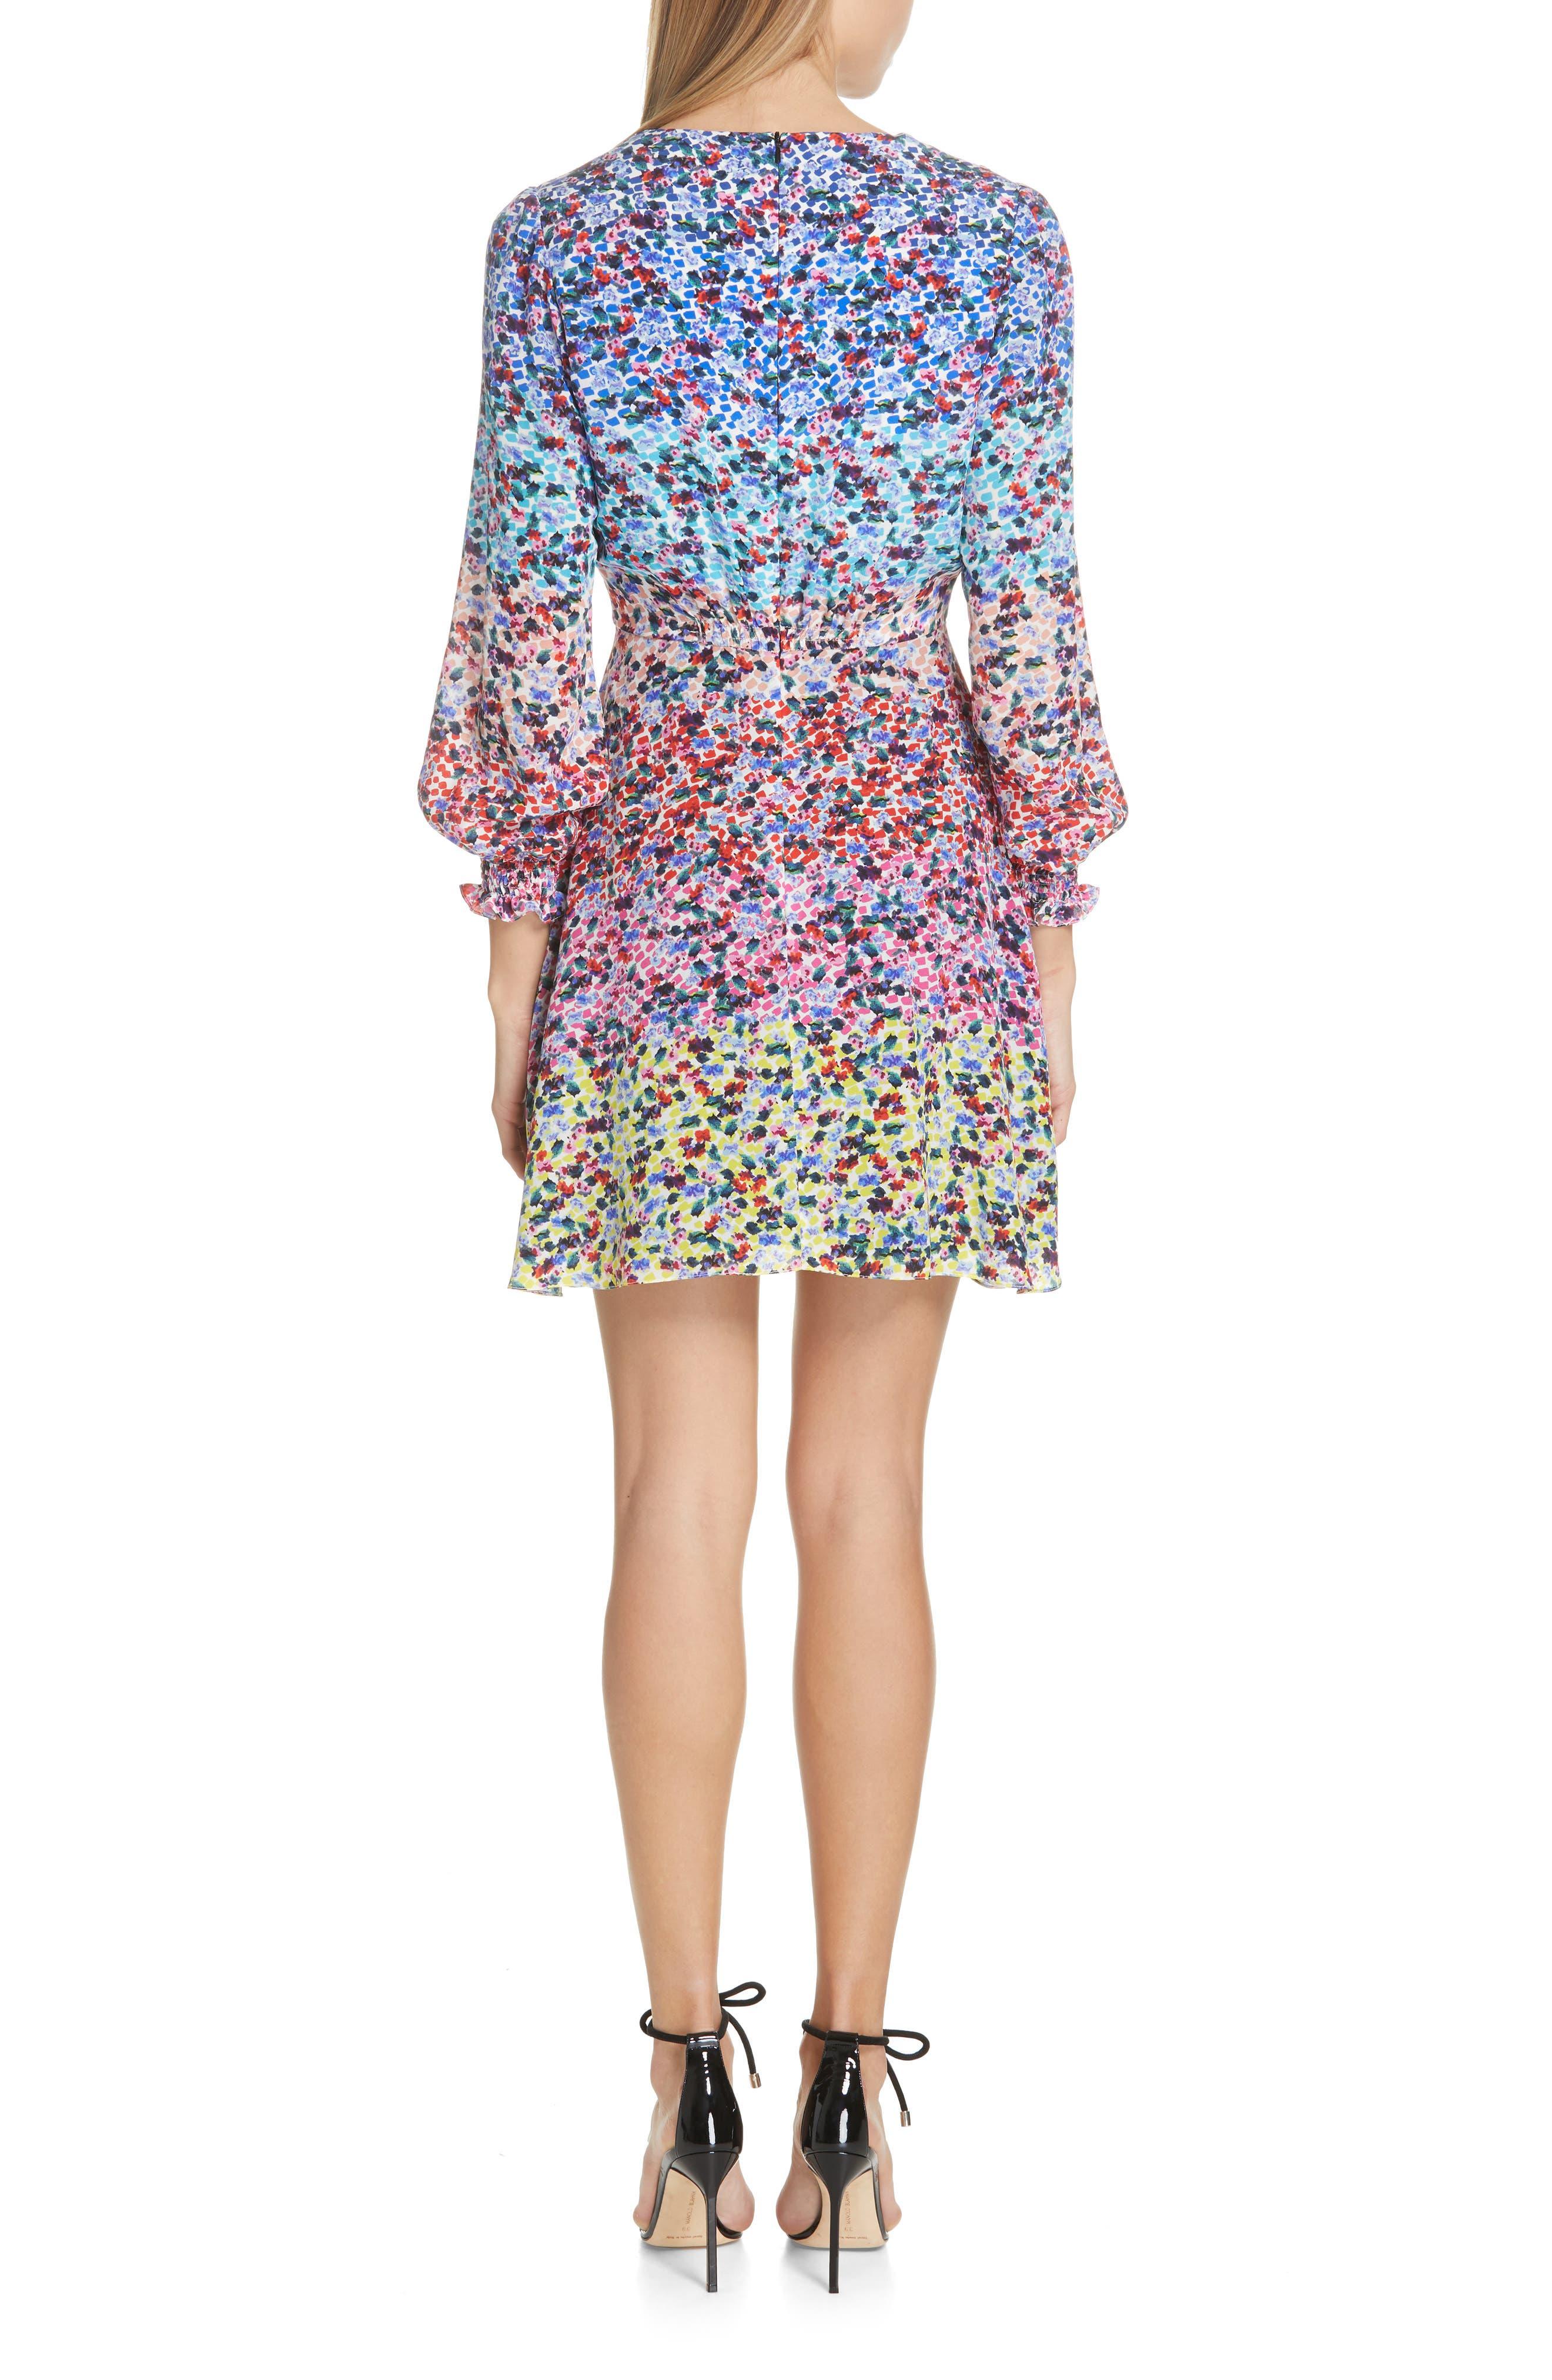 SALONI, Eve Floral Print Dress, Alternate thumbnail 2, color, RAINBOW GARDENIA PLMT